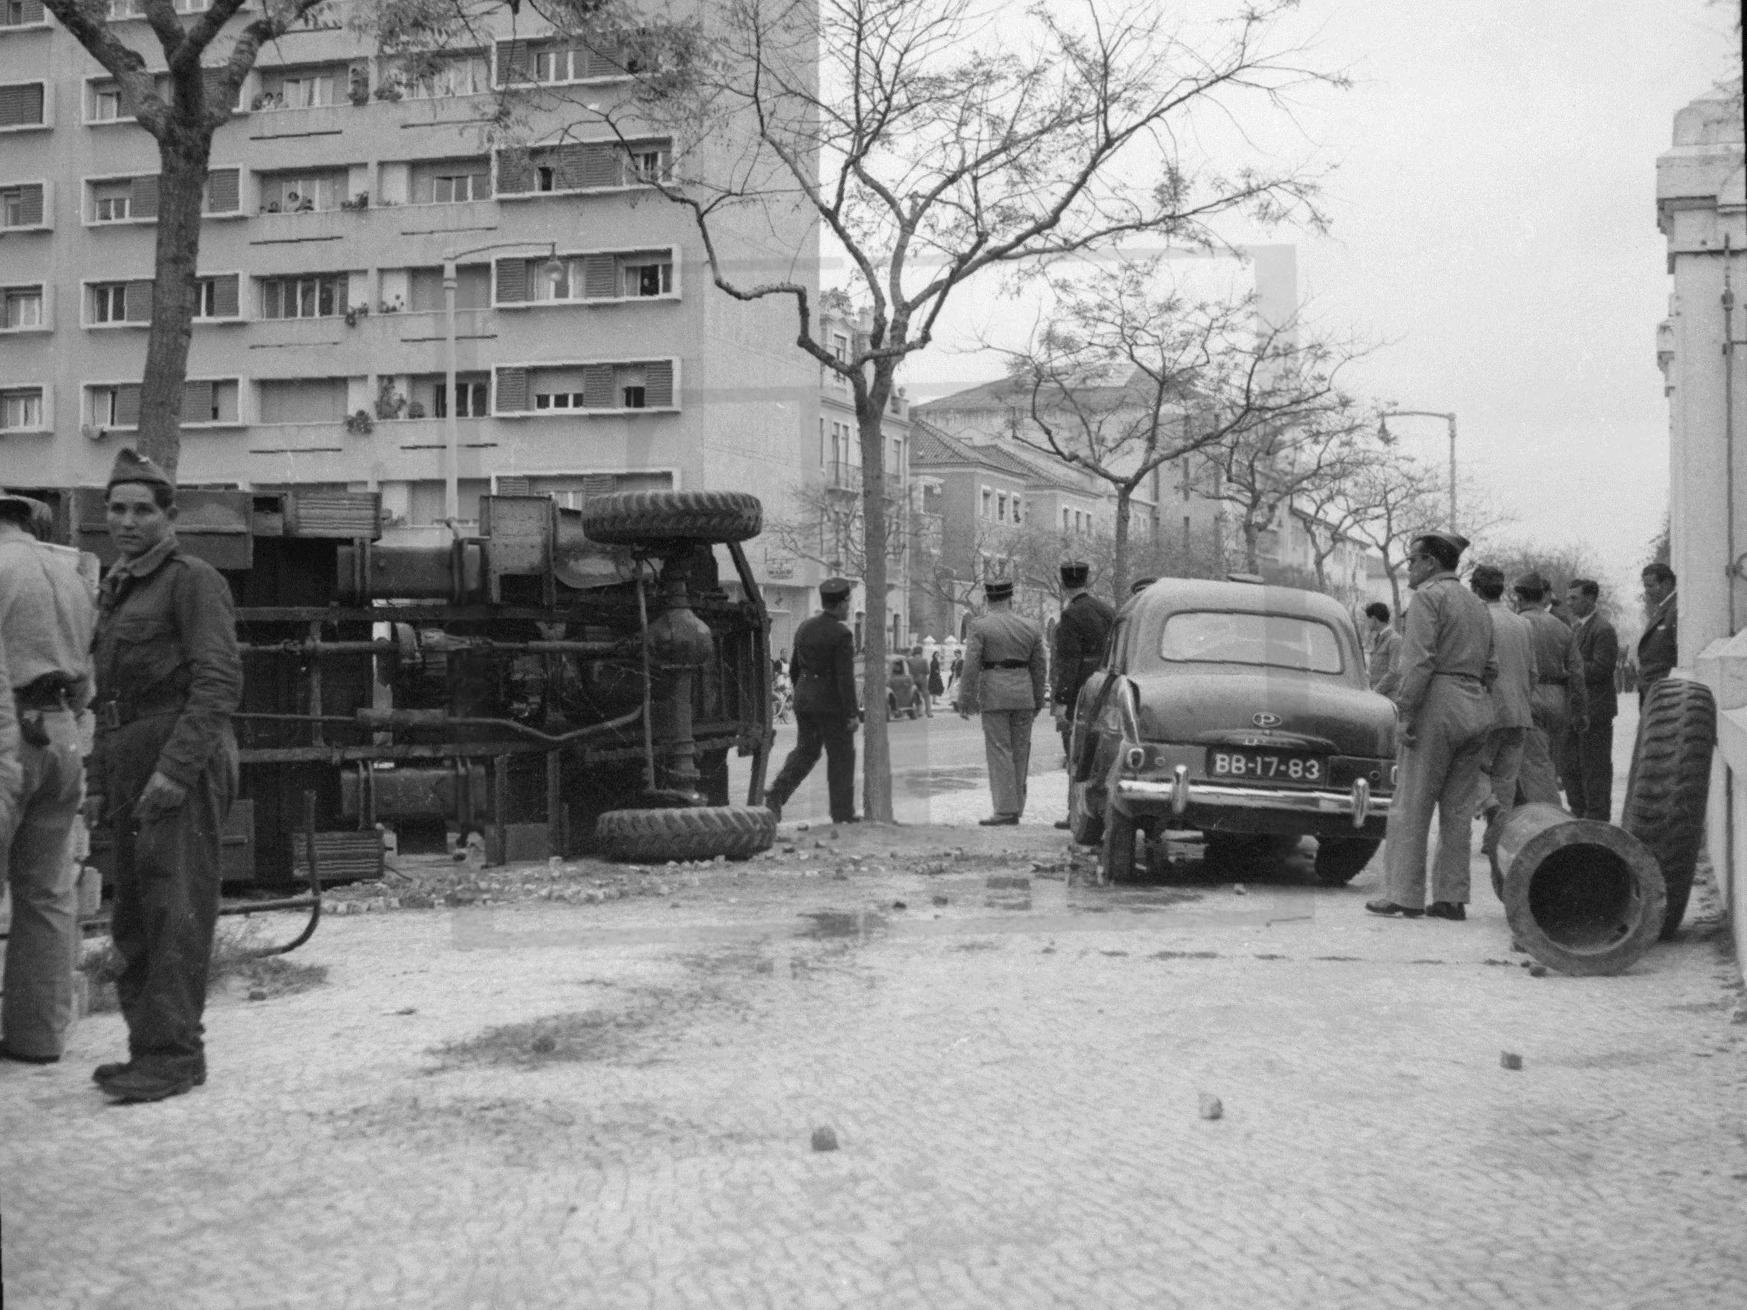 Aspecto dum desastre diante do manicómio, Av. do Brasil, [s.d.]. A.N.T.T.. A. n/  id.